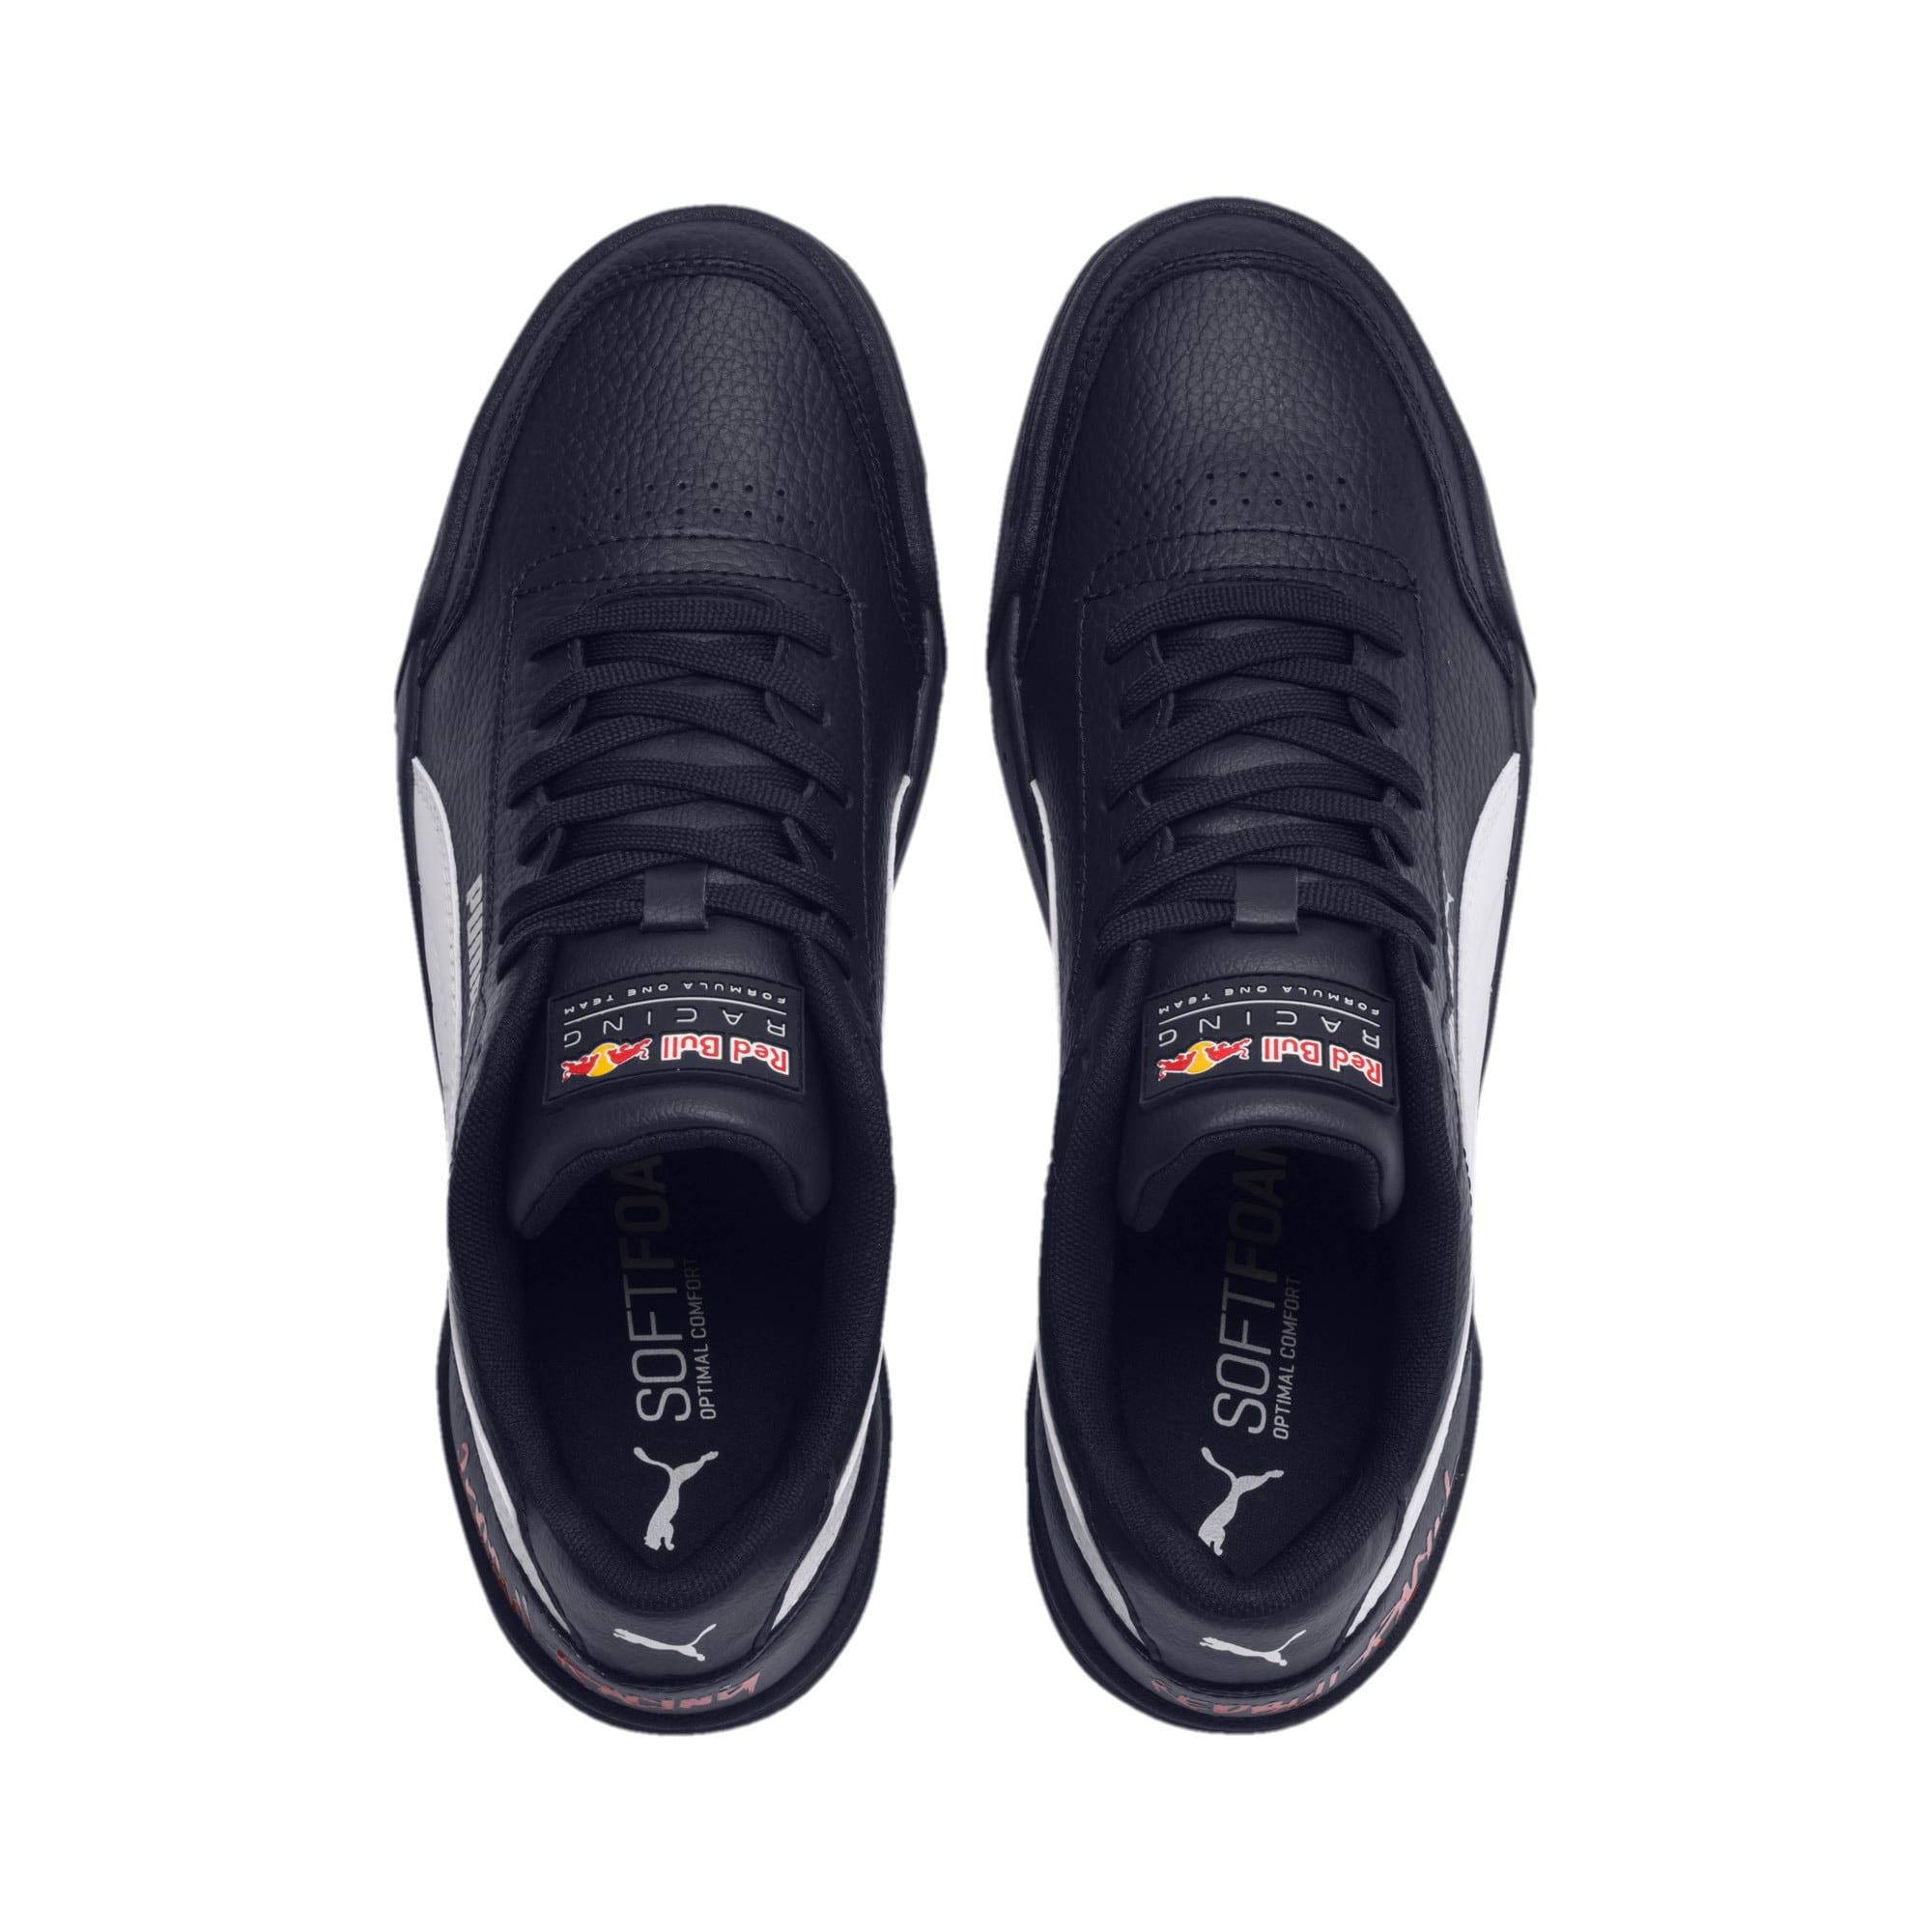 Thumbnail 7 of Red Bull Racing Caracal Sneaker, NIGHT SKY-PumaWhite-NIGHTSKY, medium